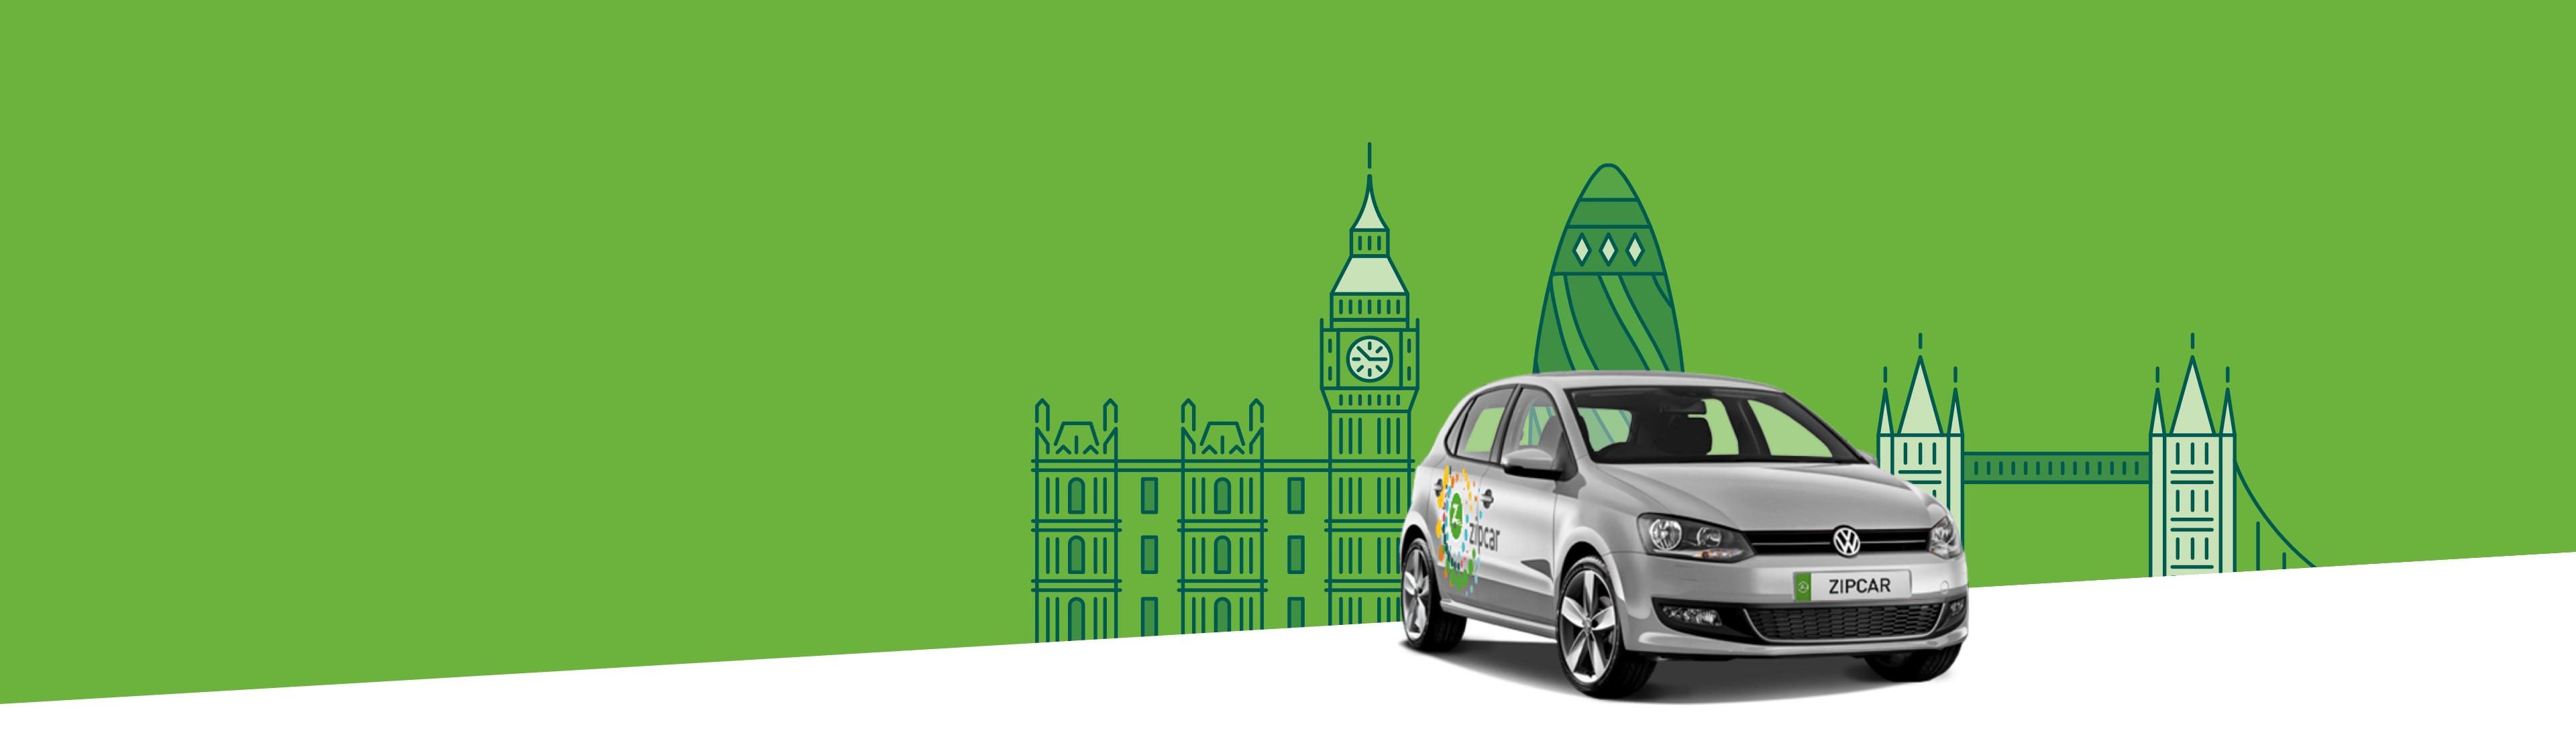 Zipcar Uk Car Sharing An Alternative To Car Hire With Zipcar